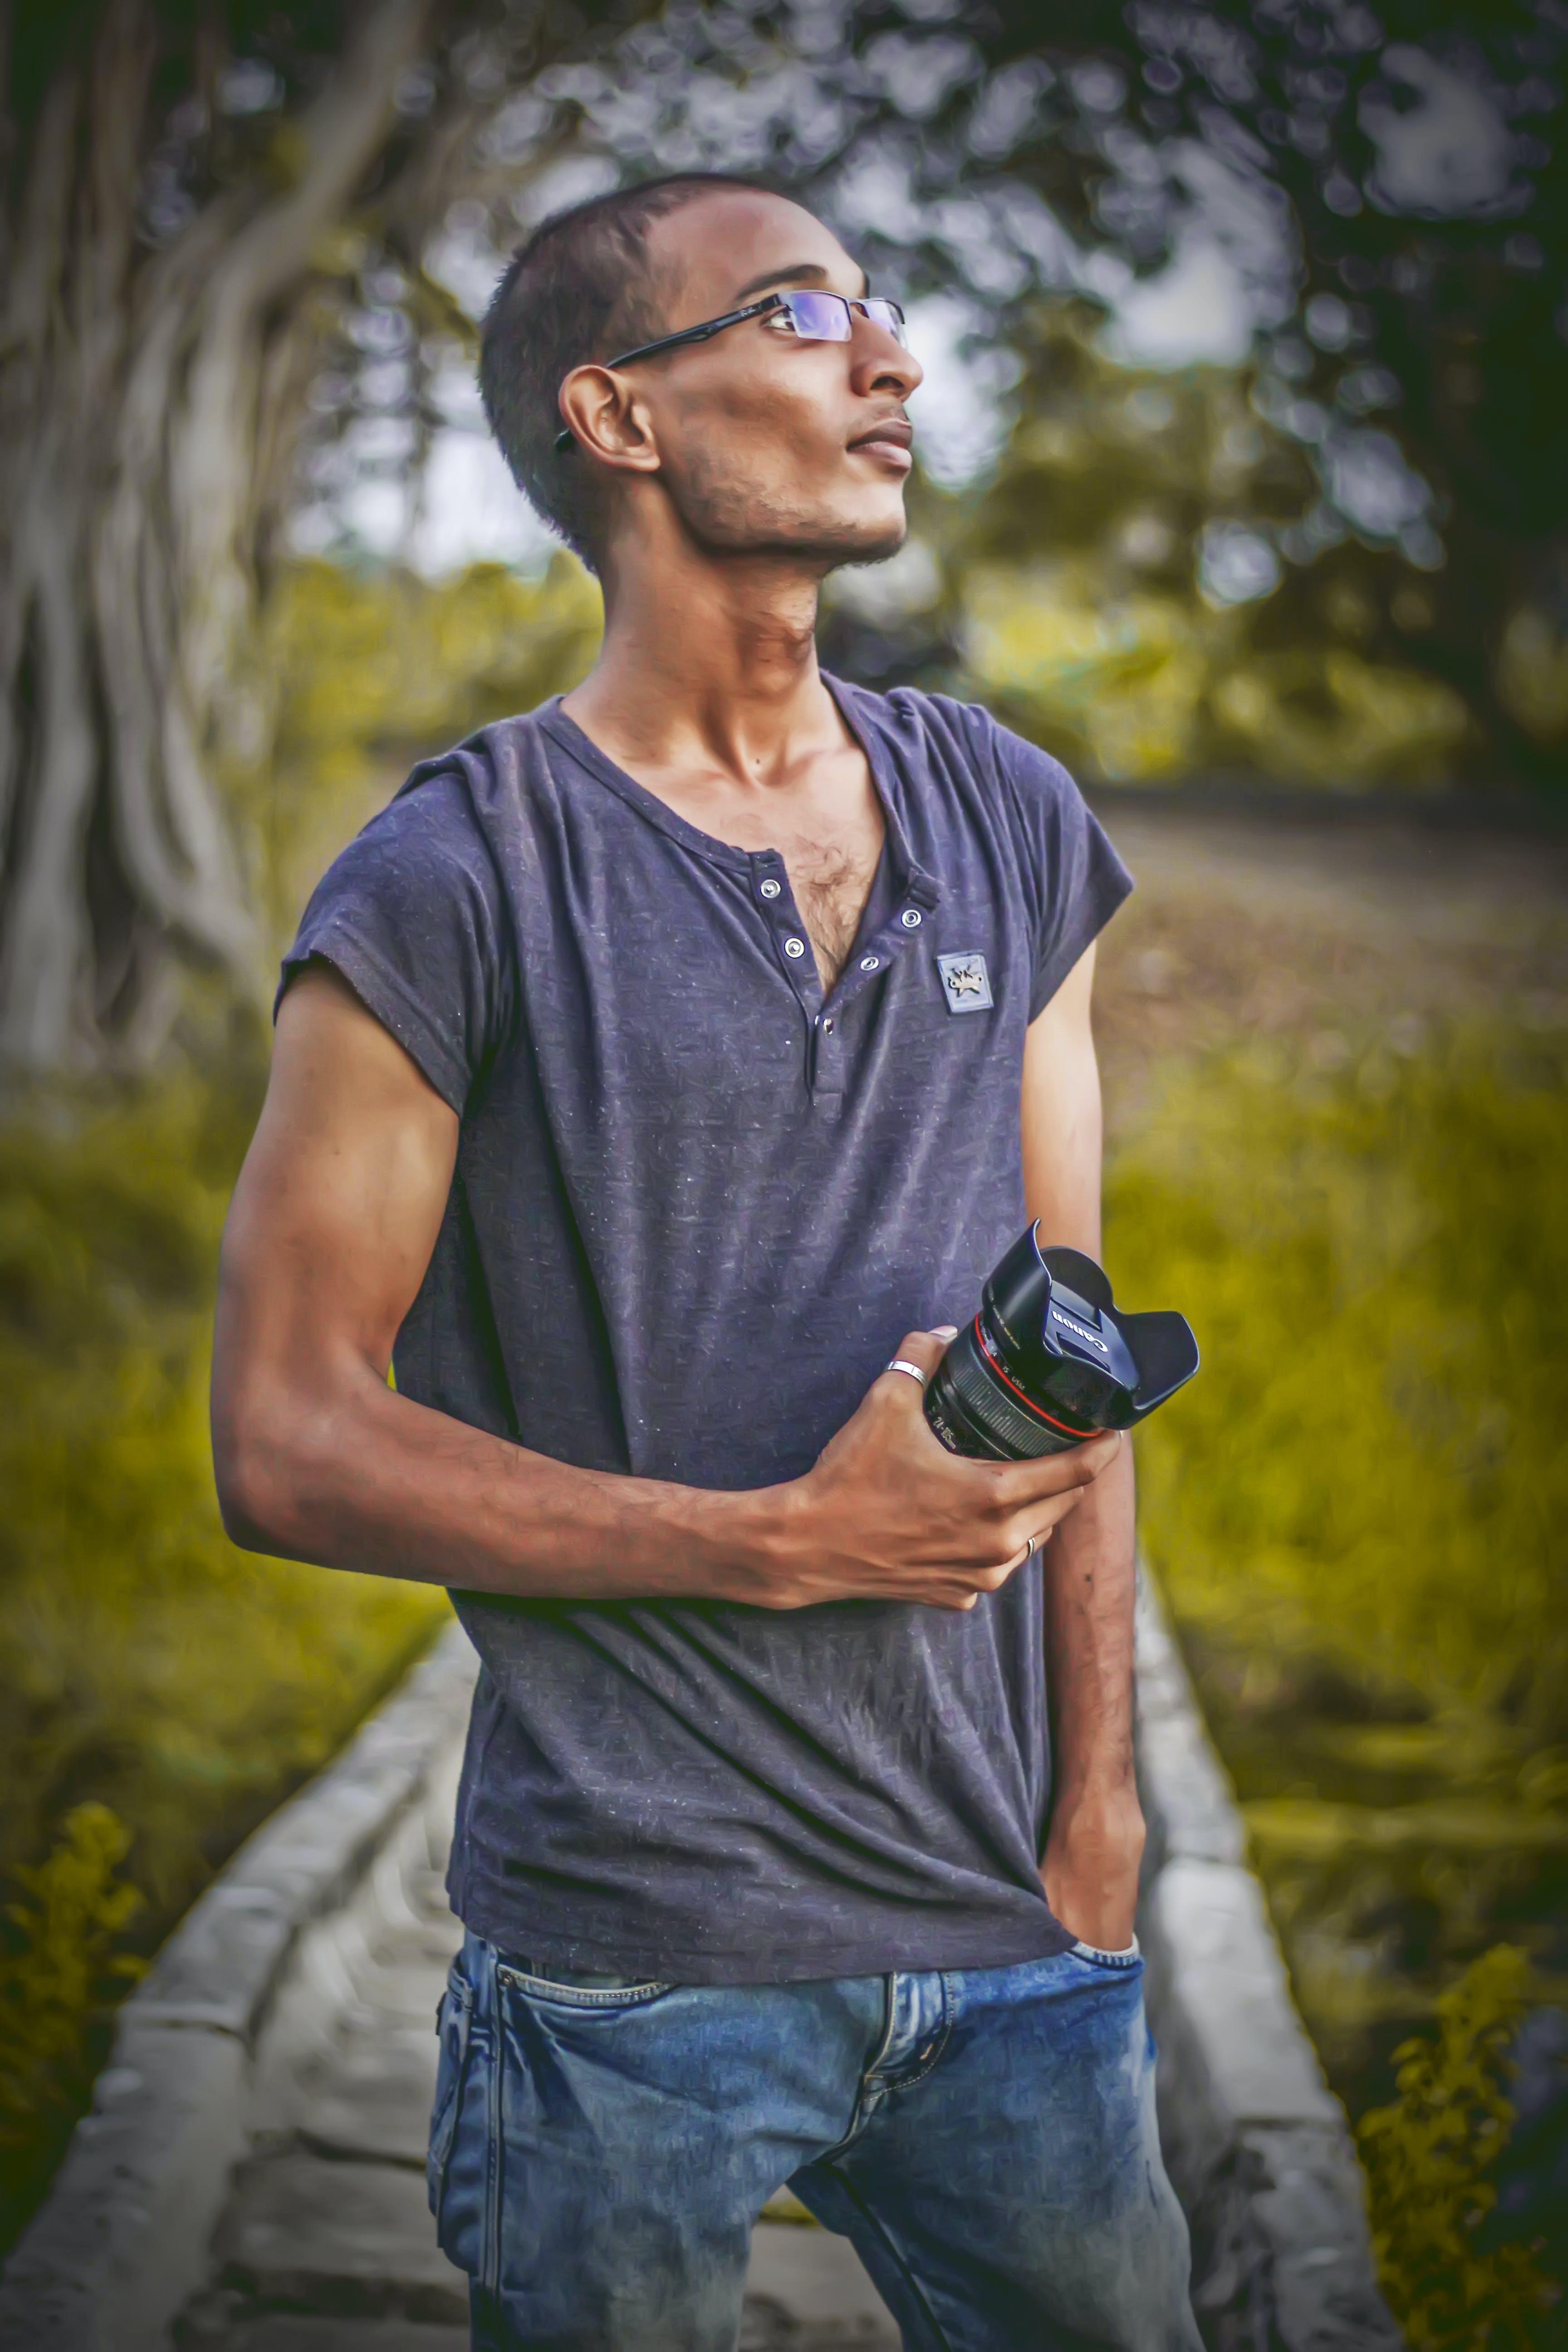 Shallow Focus Photography of Man Wearing Gray T-shirt Holding Dslr Camera Lens